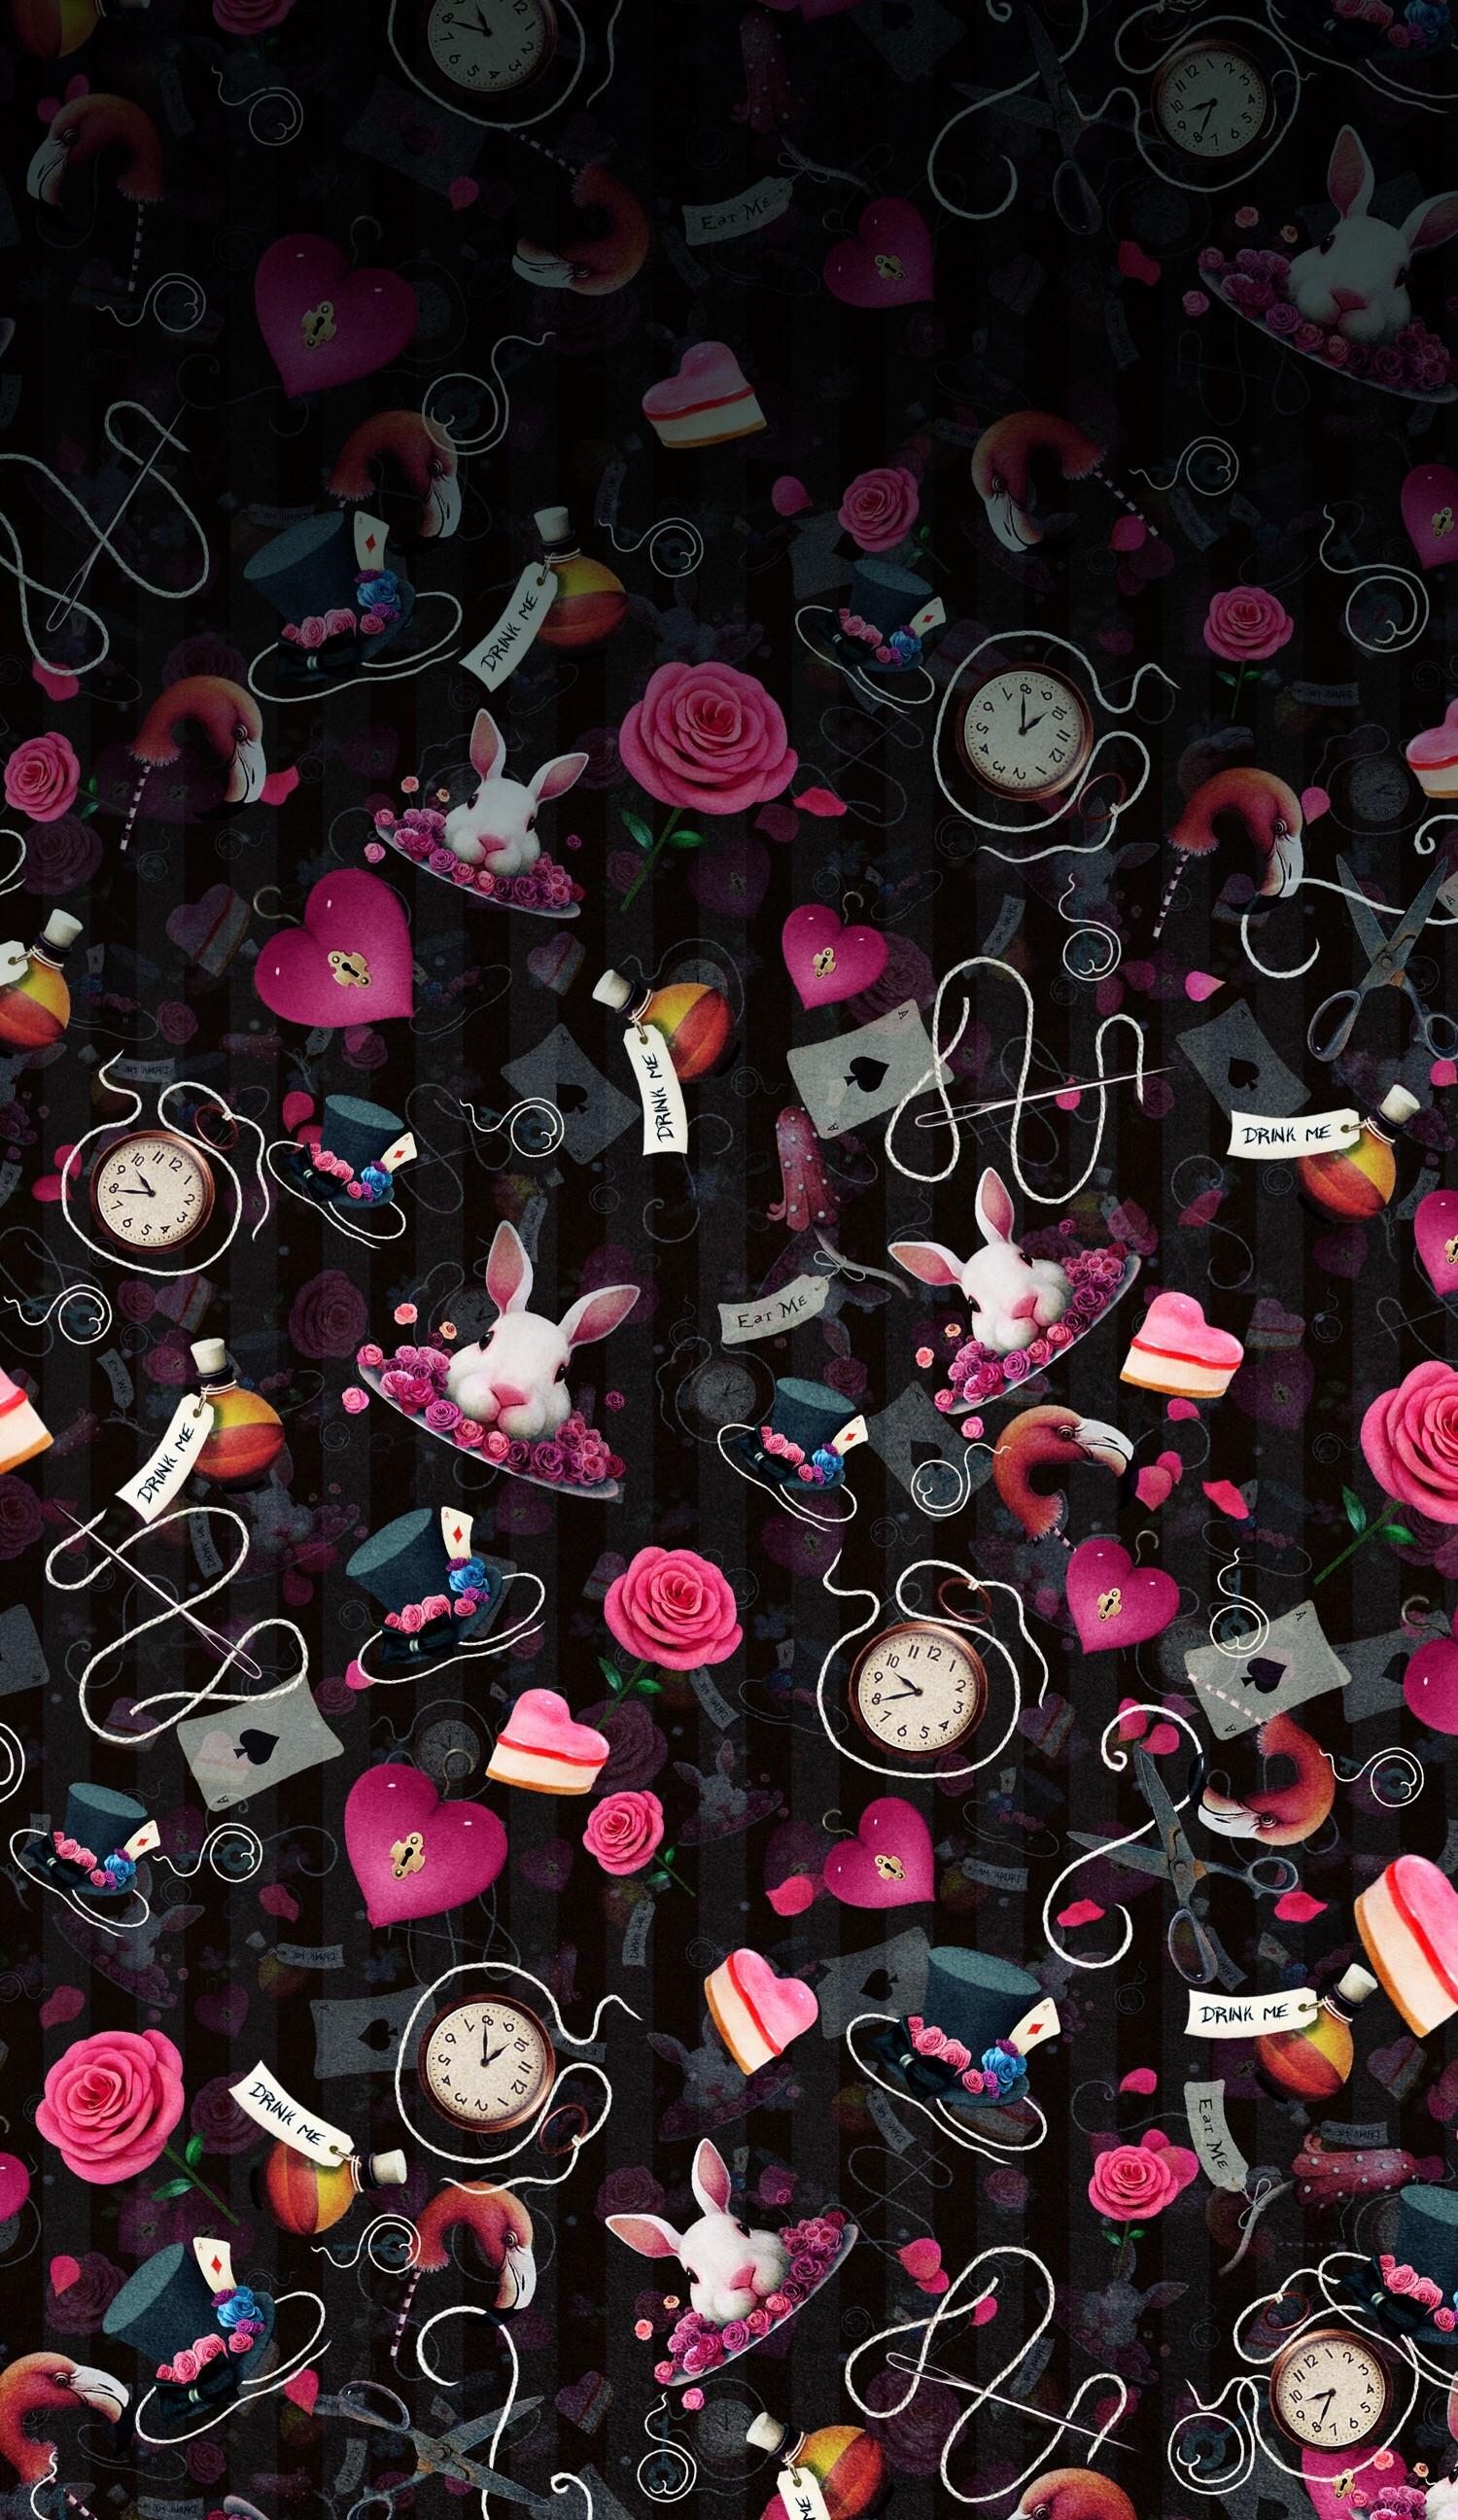 Alice in wonderland wallpaper iphone 65 images - Free wallpaper alice in wonderland ...